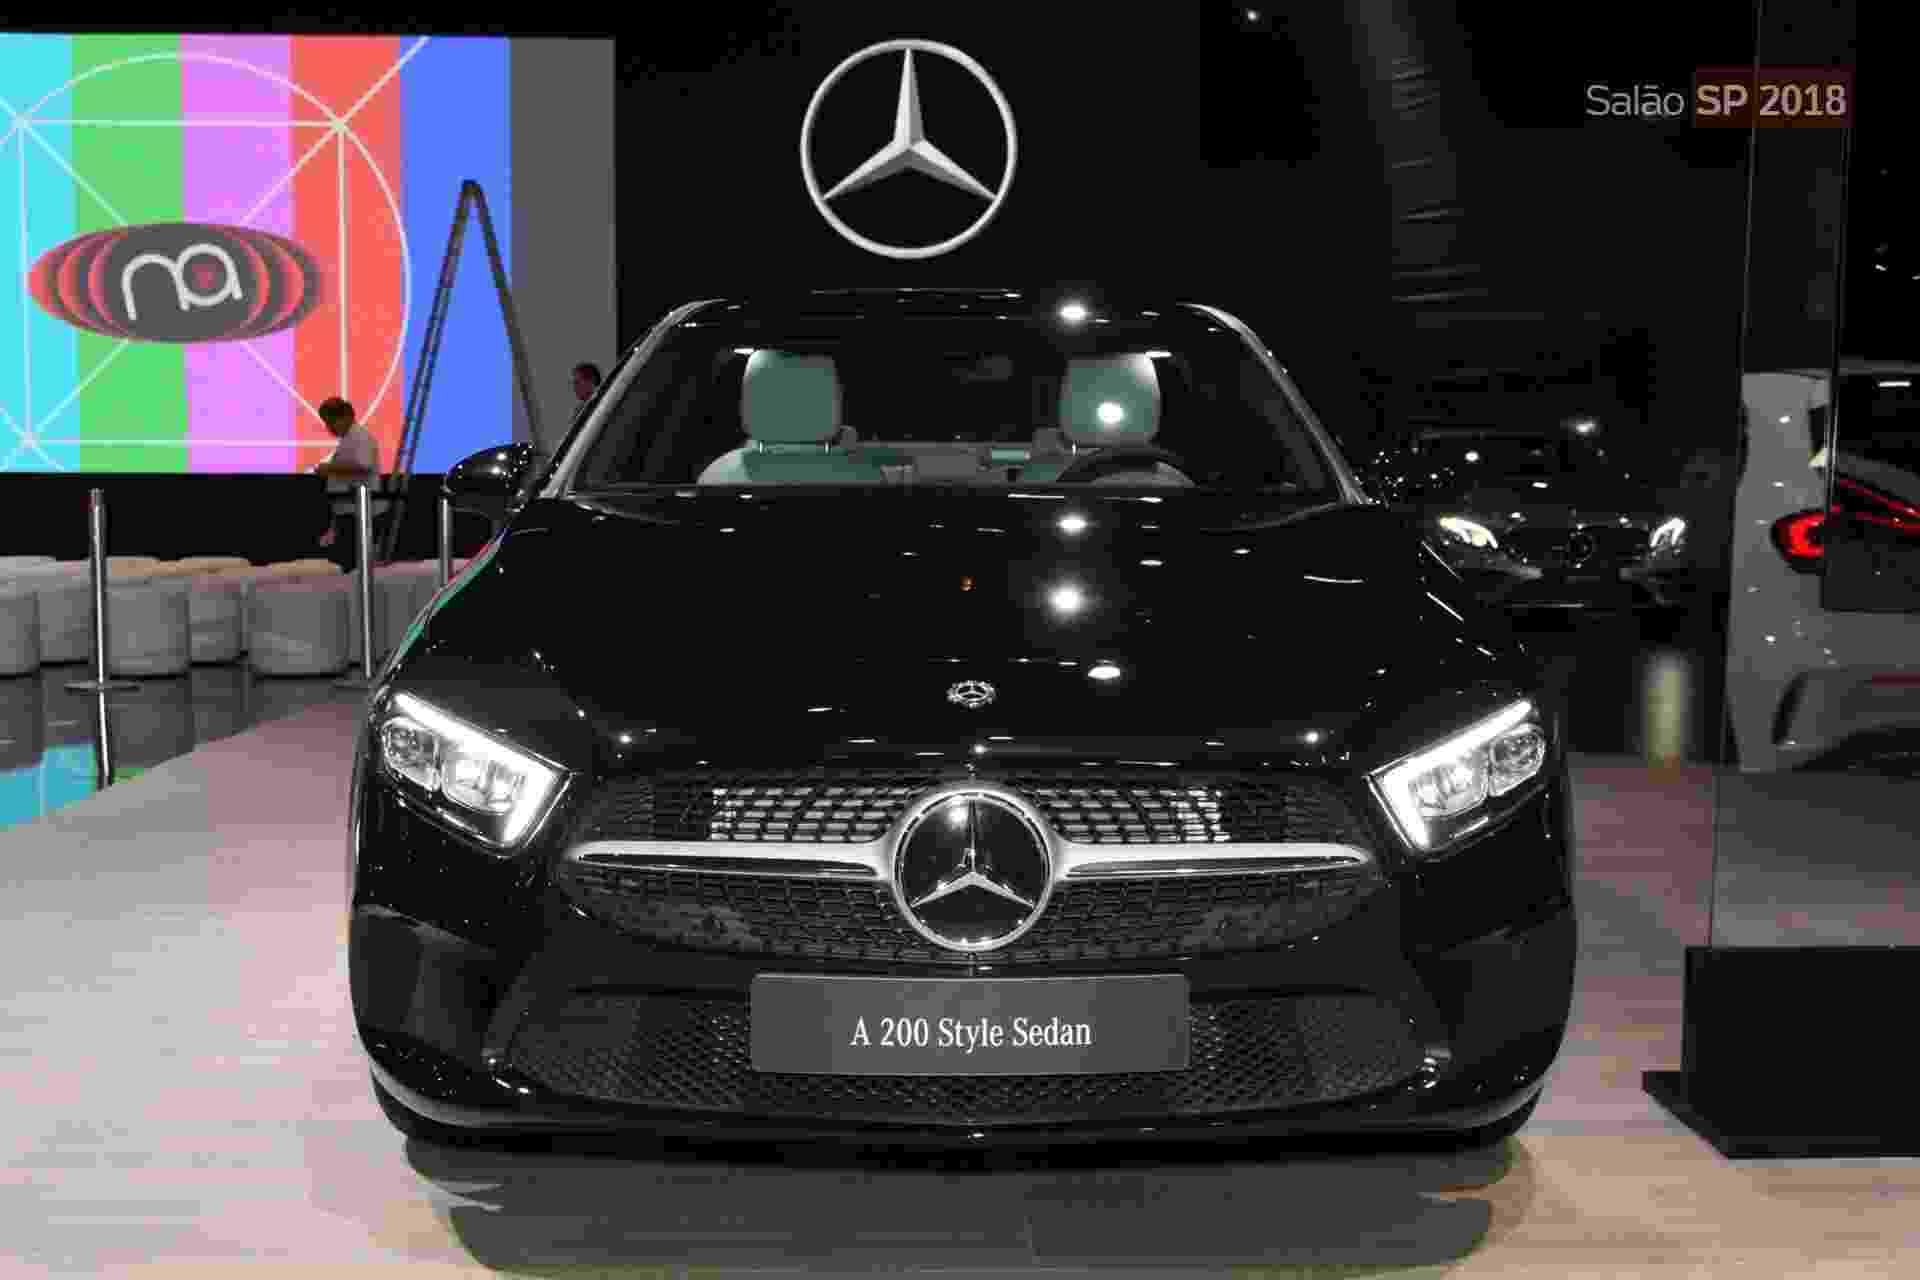 Mercedes-Benz Classe A Sedan - Murilo Góes/UOL